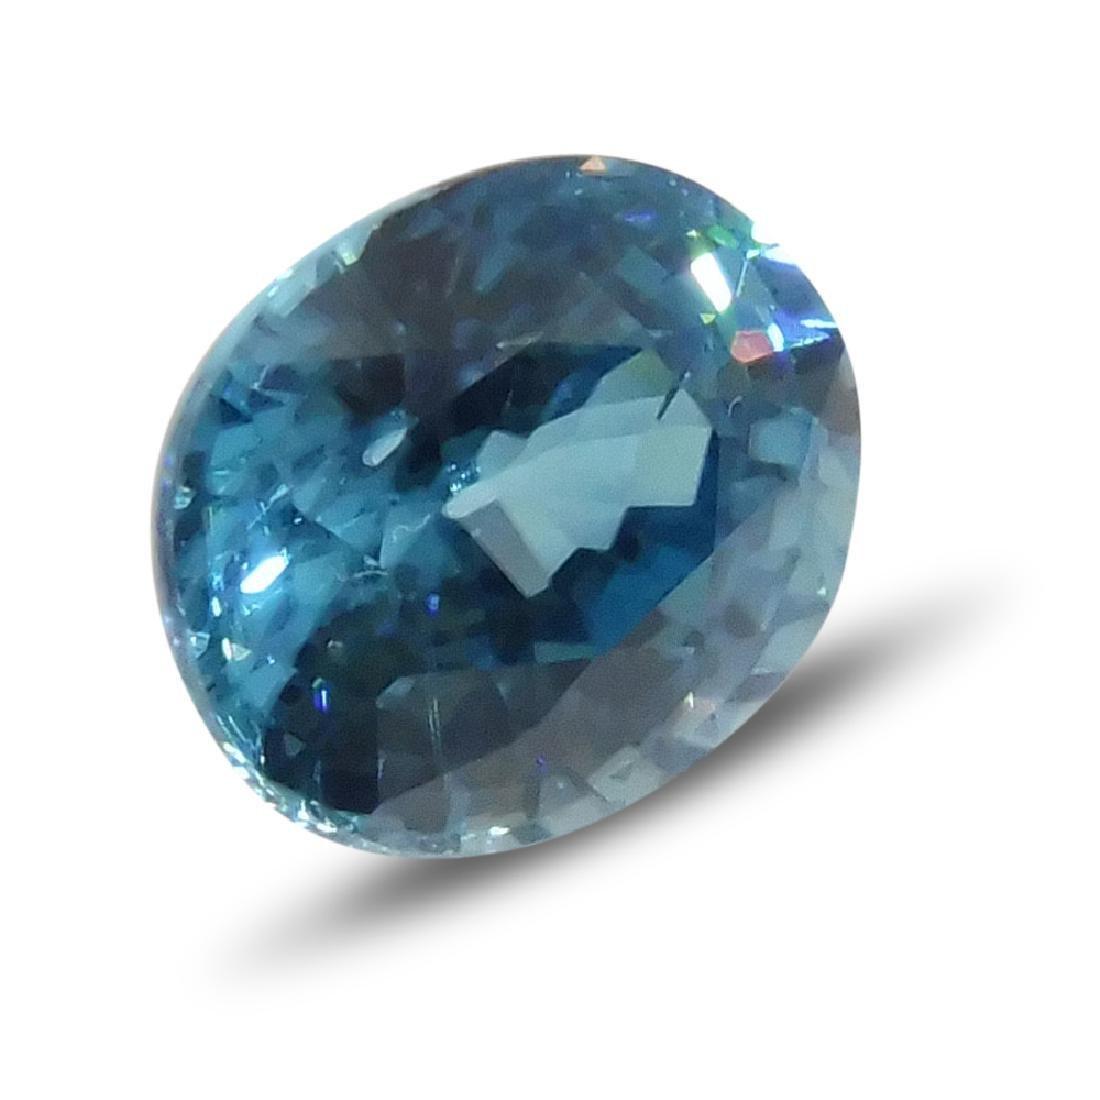 4.21 Carat Loose Oval Blue Zircon - 3